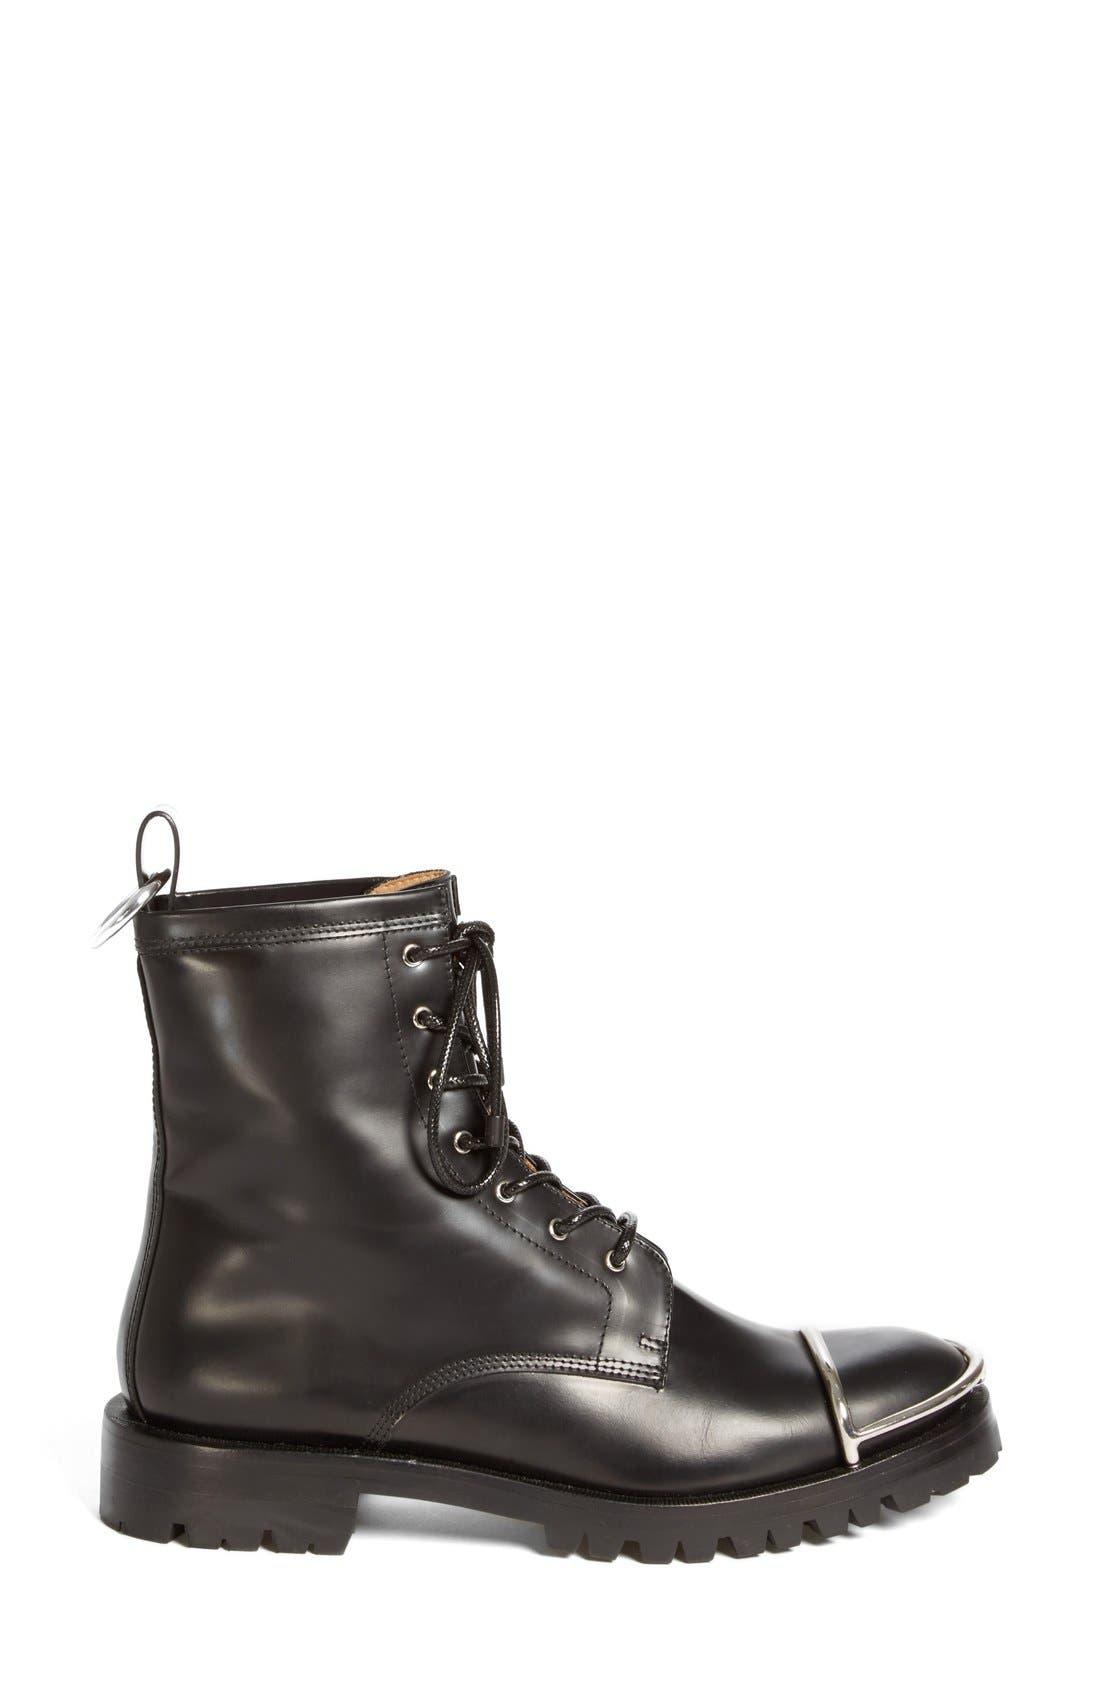 Alternate Image 3  - Alexander Wang 'Lyndon' Military Boot (Women)